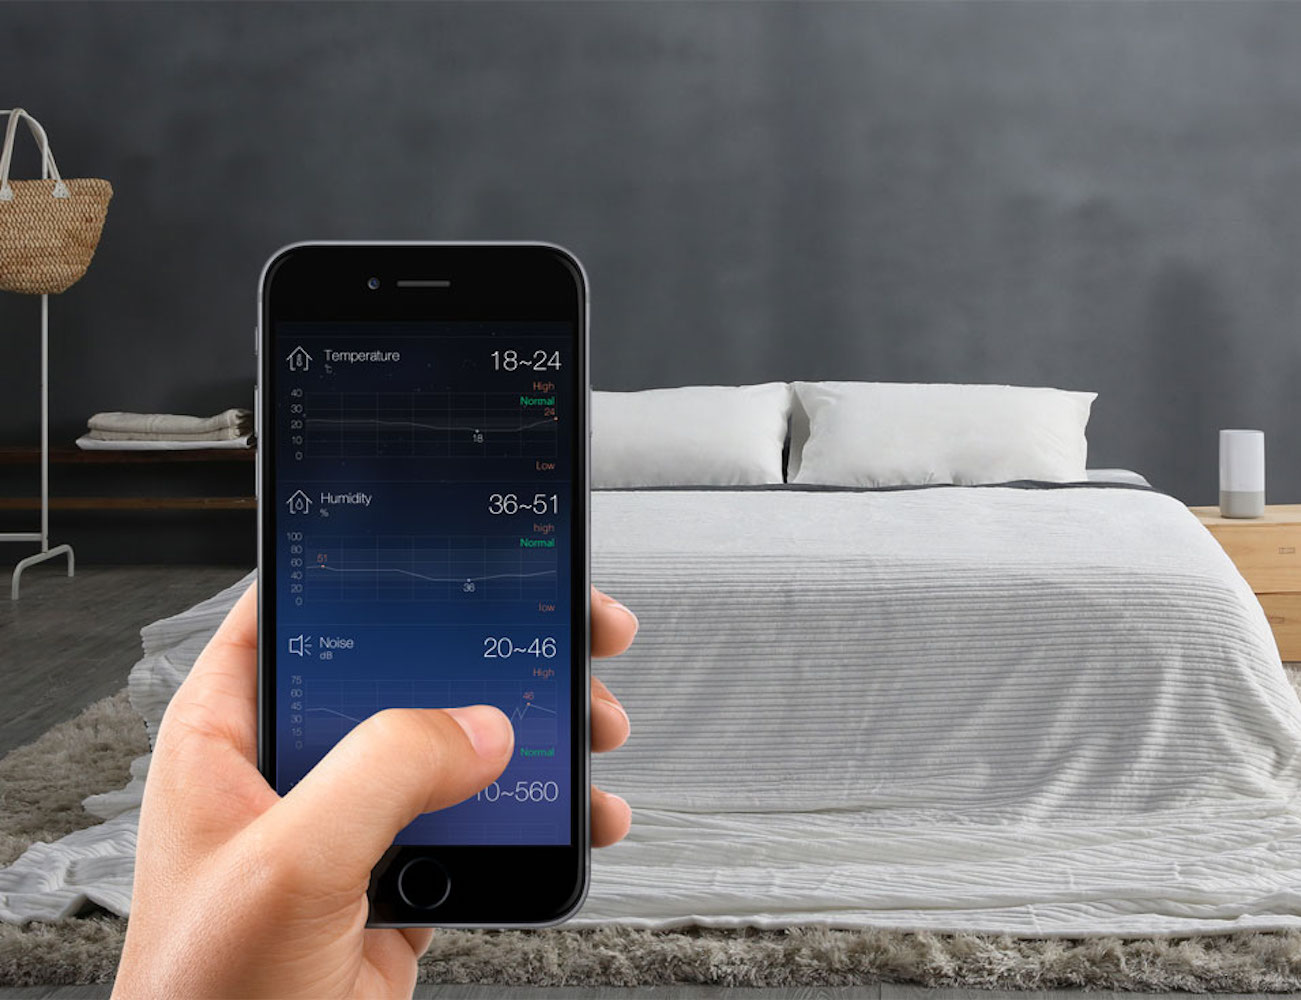 Nox Smart Sleep Light From Sleepace